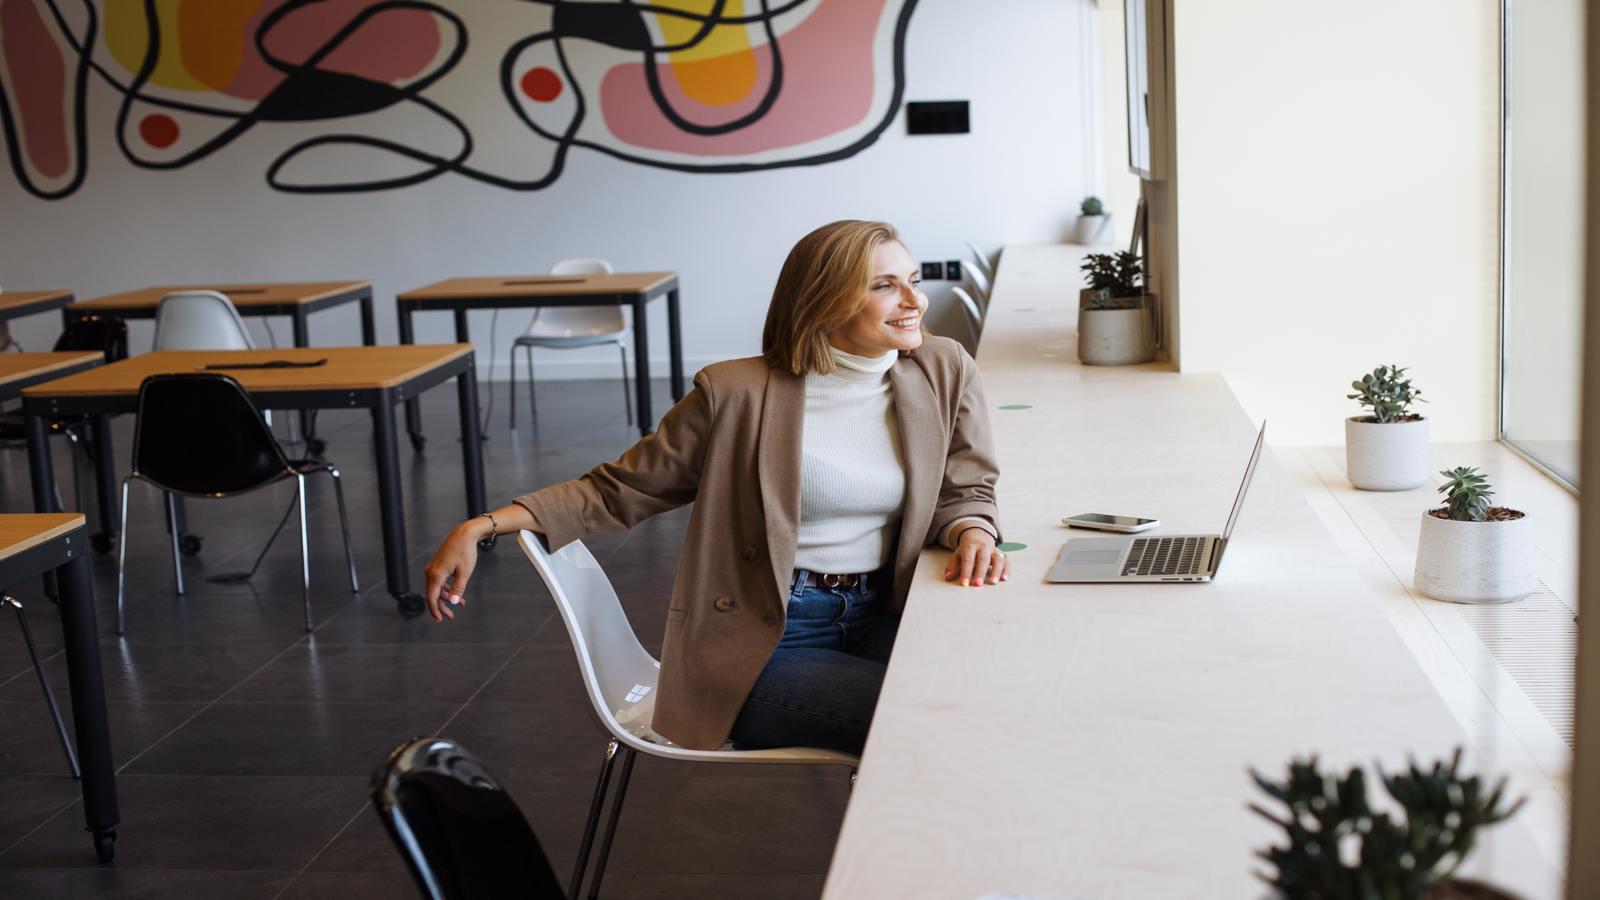 Every Polyglot's Dream Job: 6 Useful Tips on How to Become a Translator